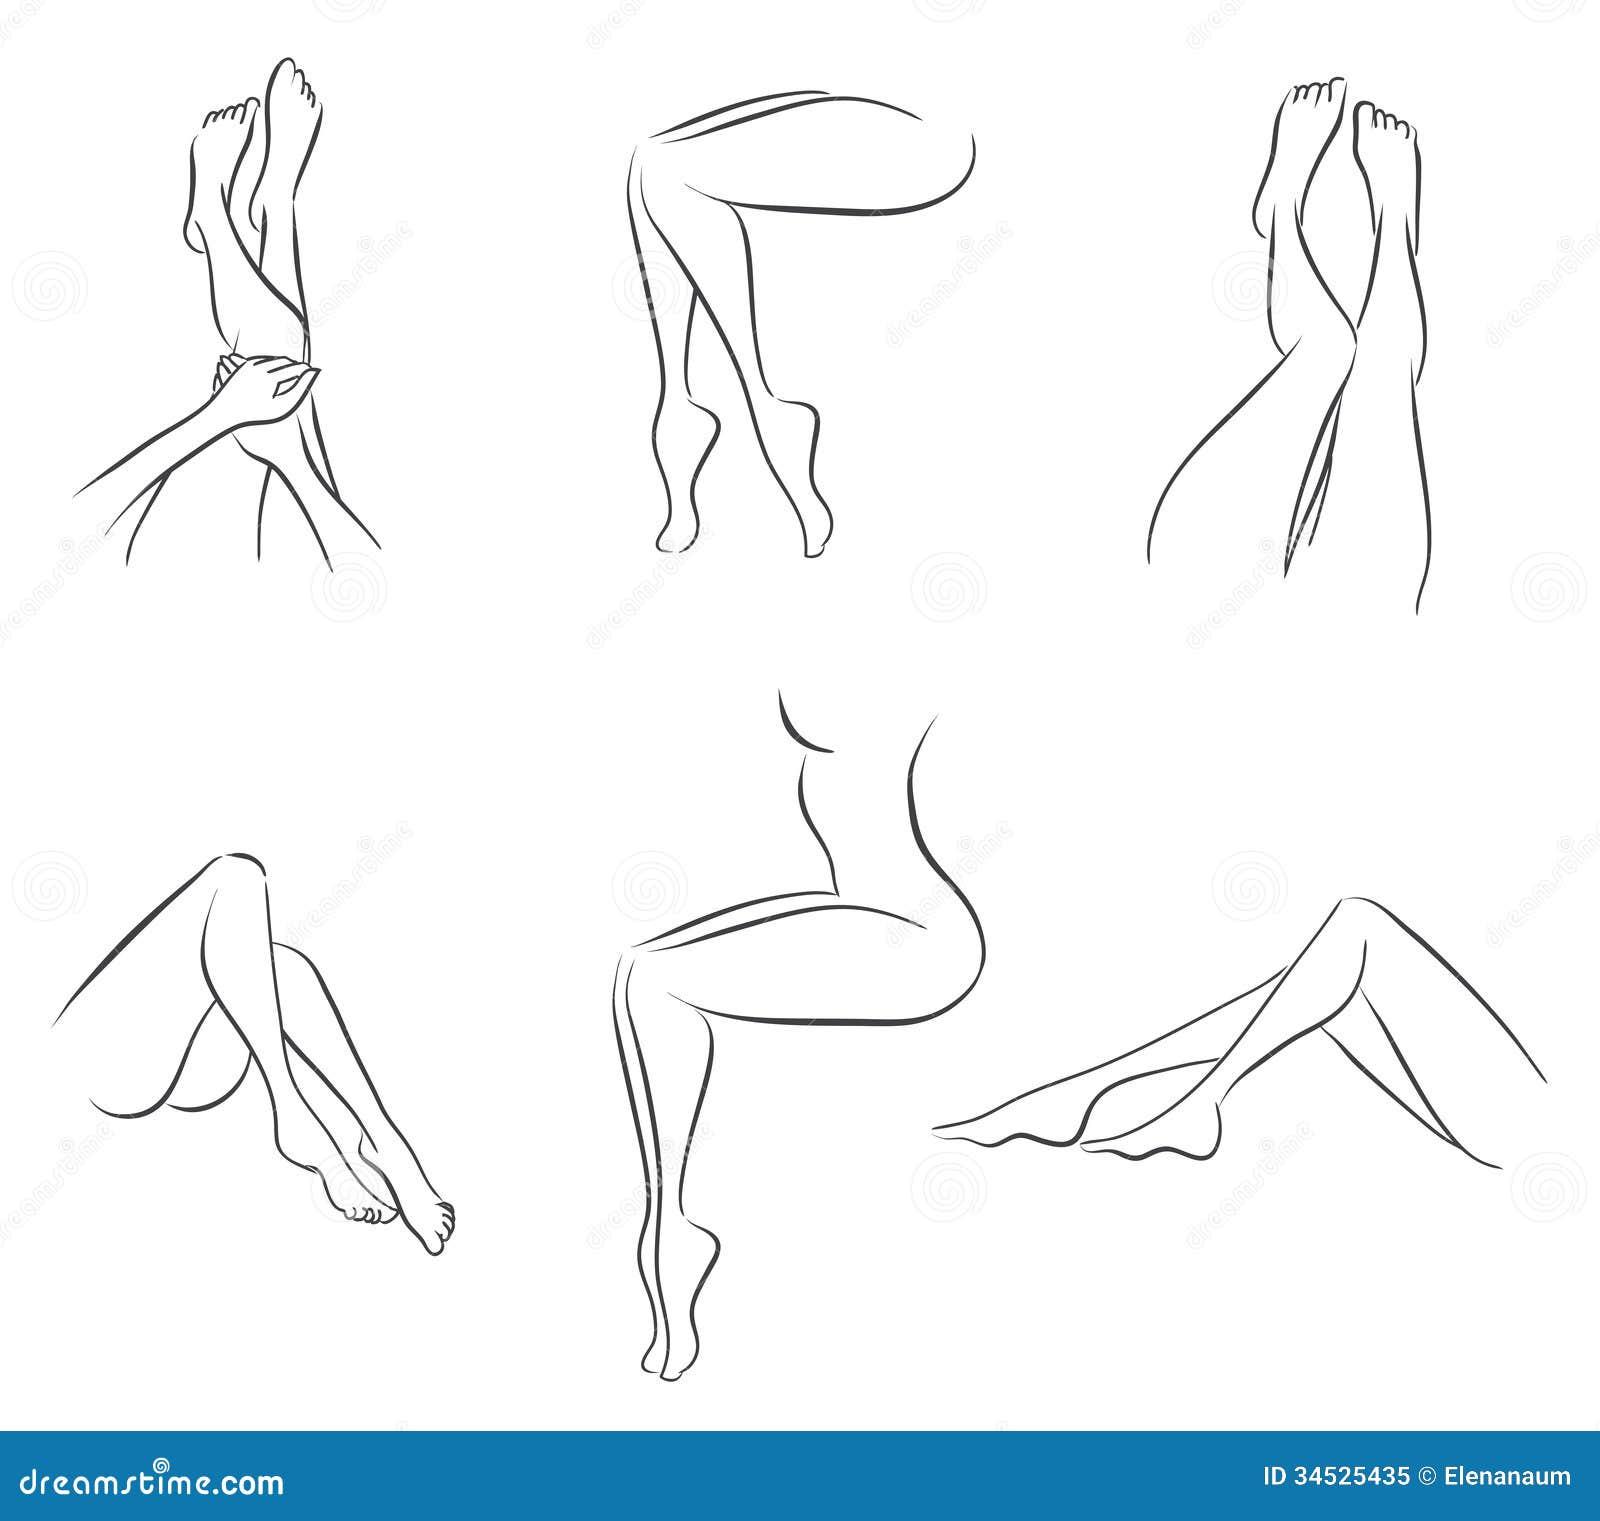 Facil for long legs big tits milf cougar 5